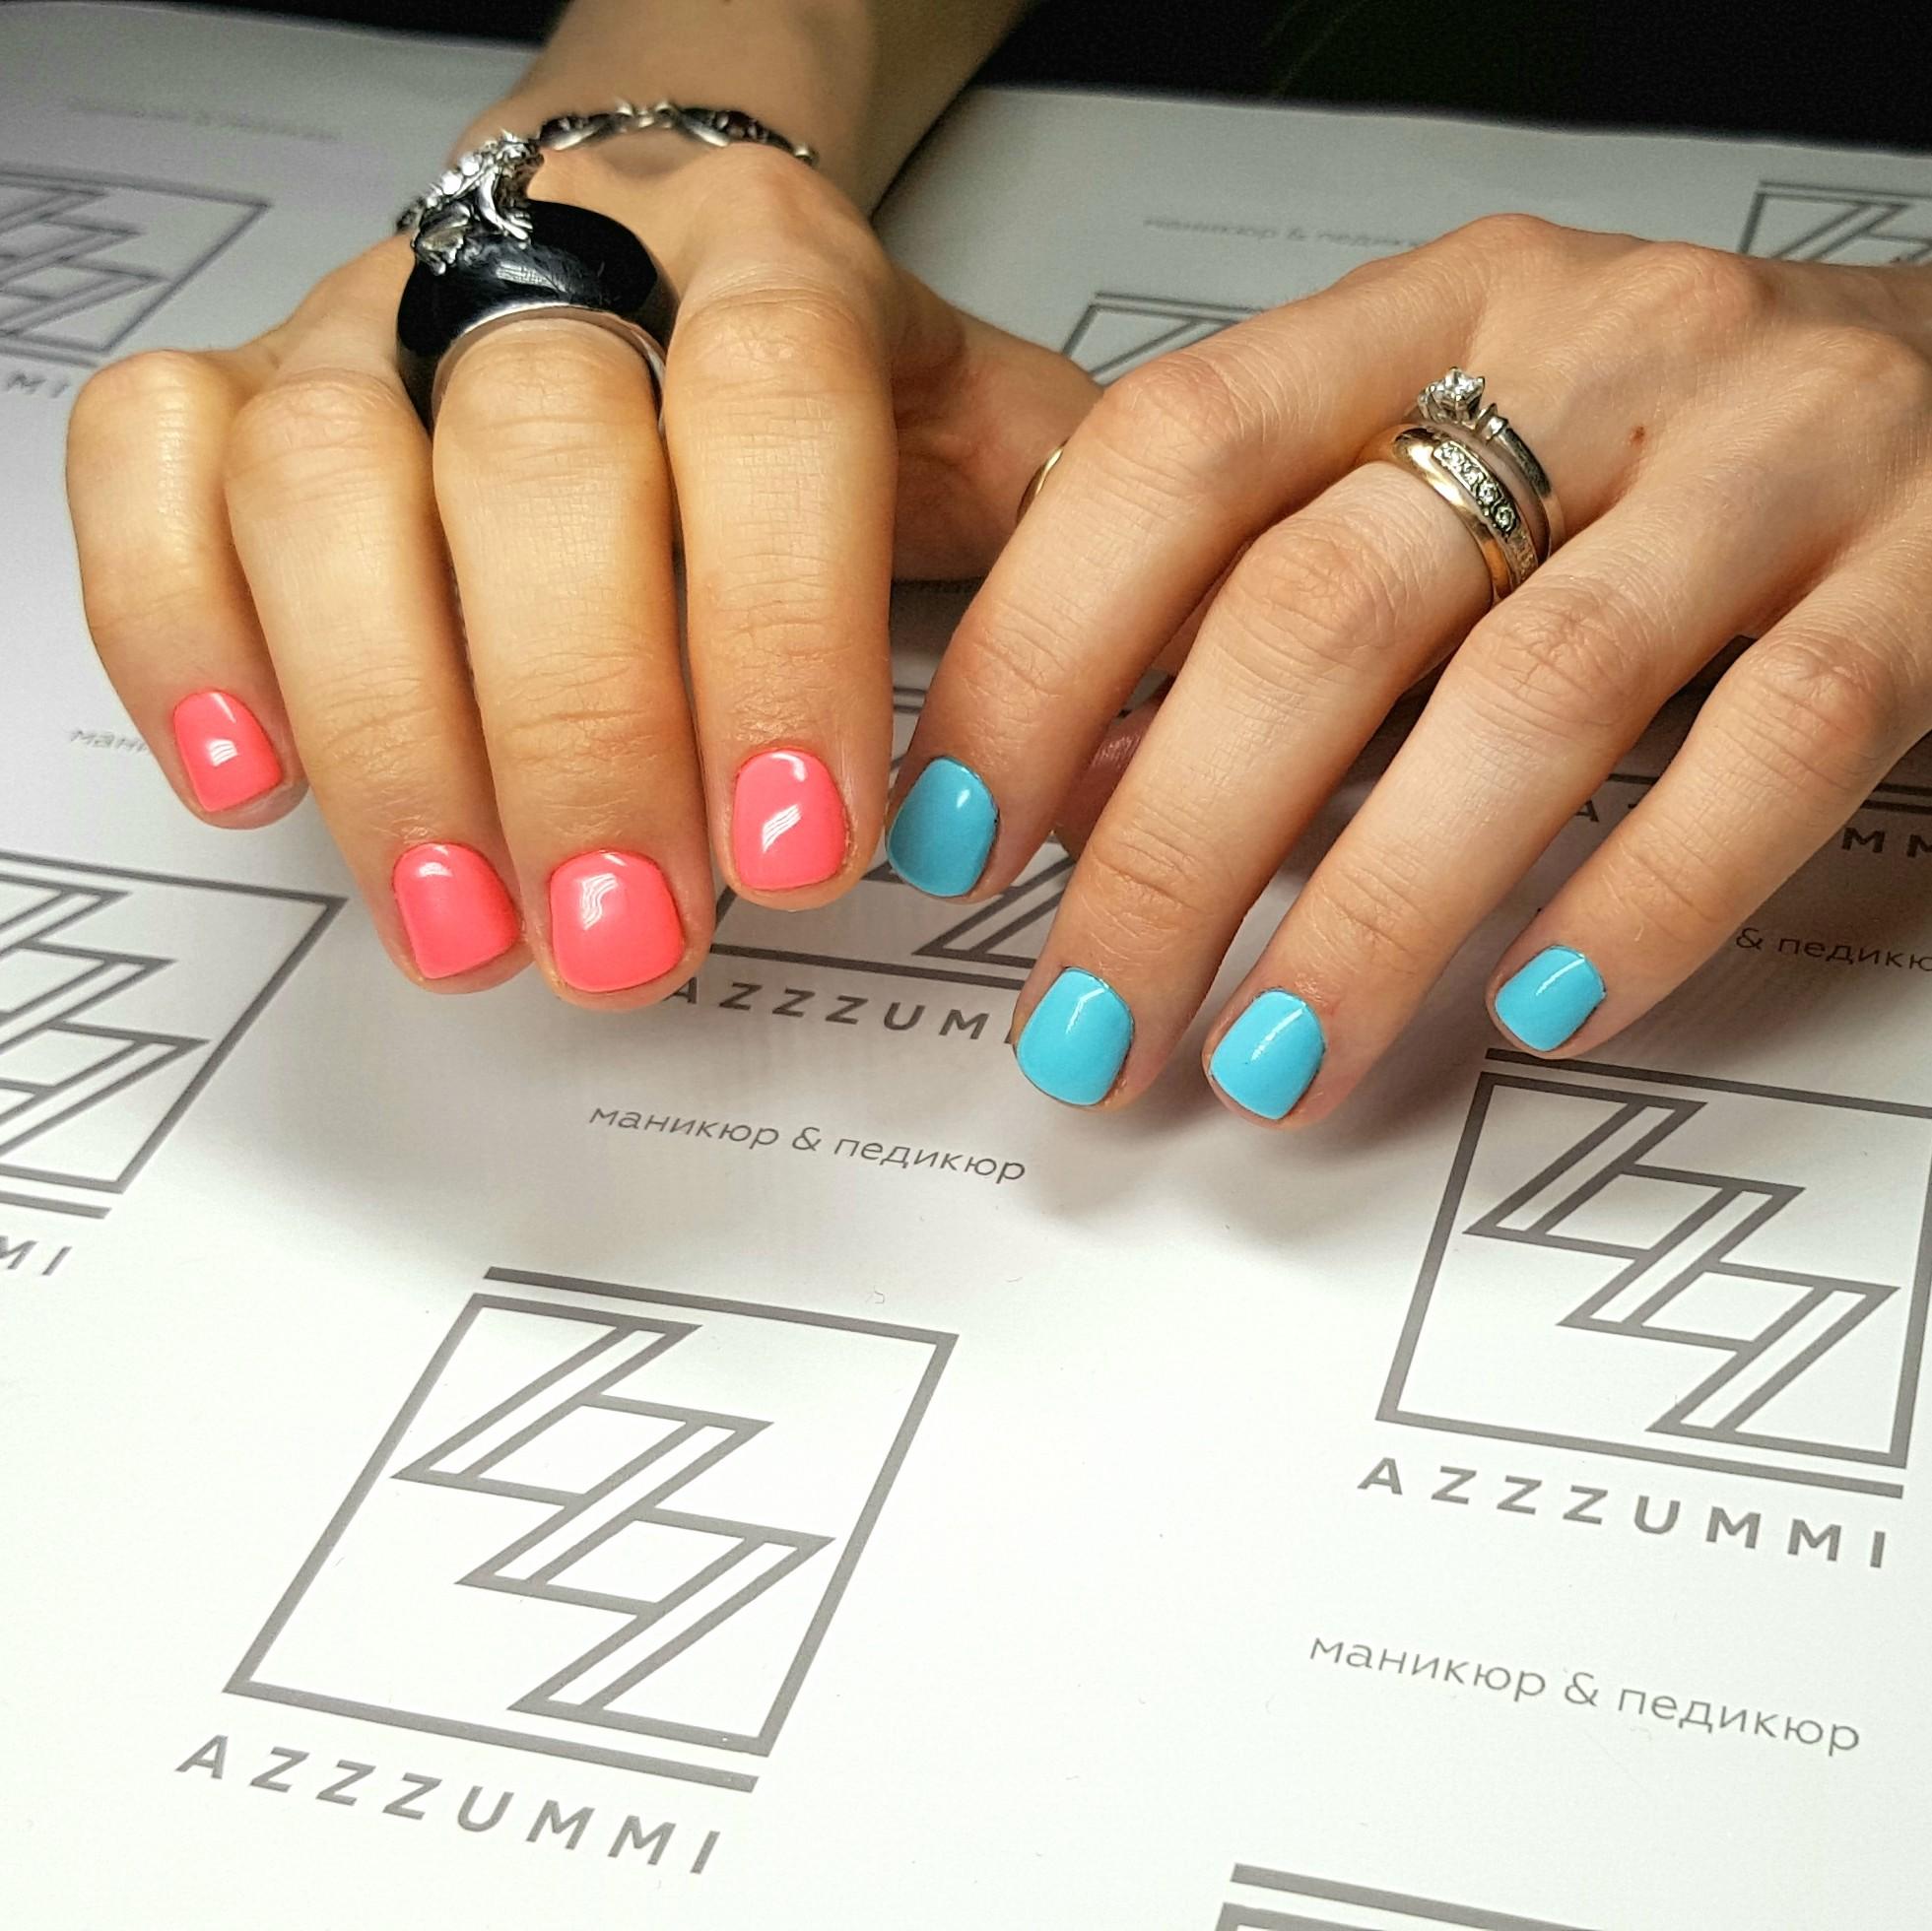 Azzzummi_nails_ 1905_розовыйиголубой2